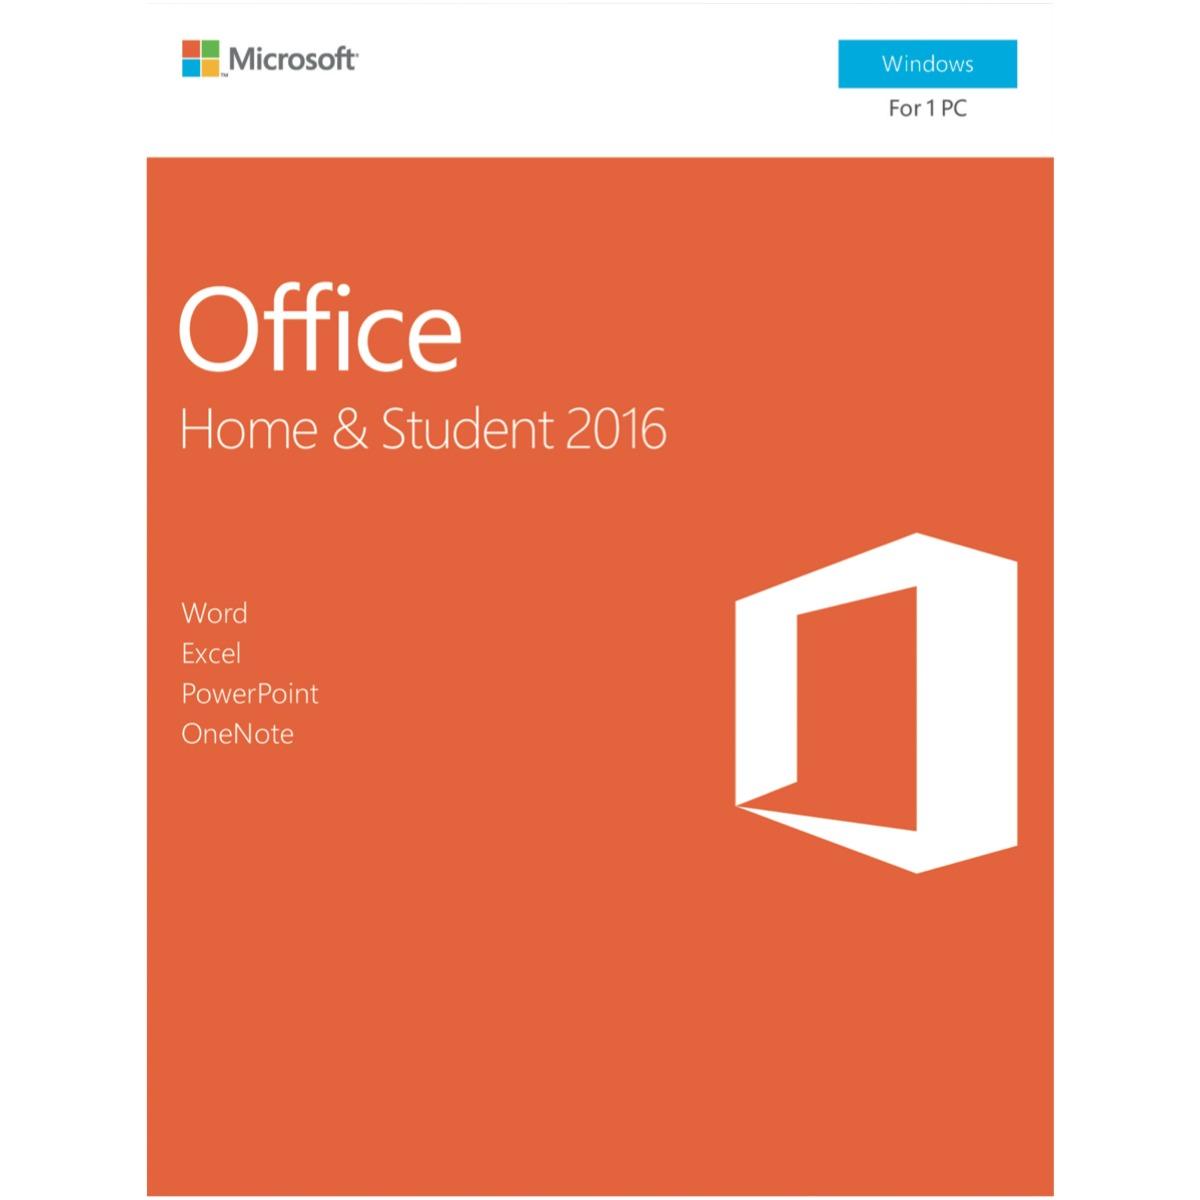 Microsoft Office Home & Student 2016 - No DVD Retail Box